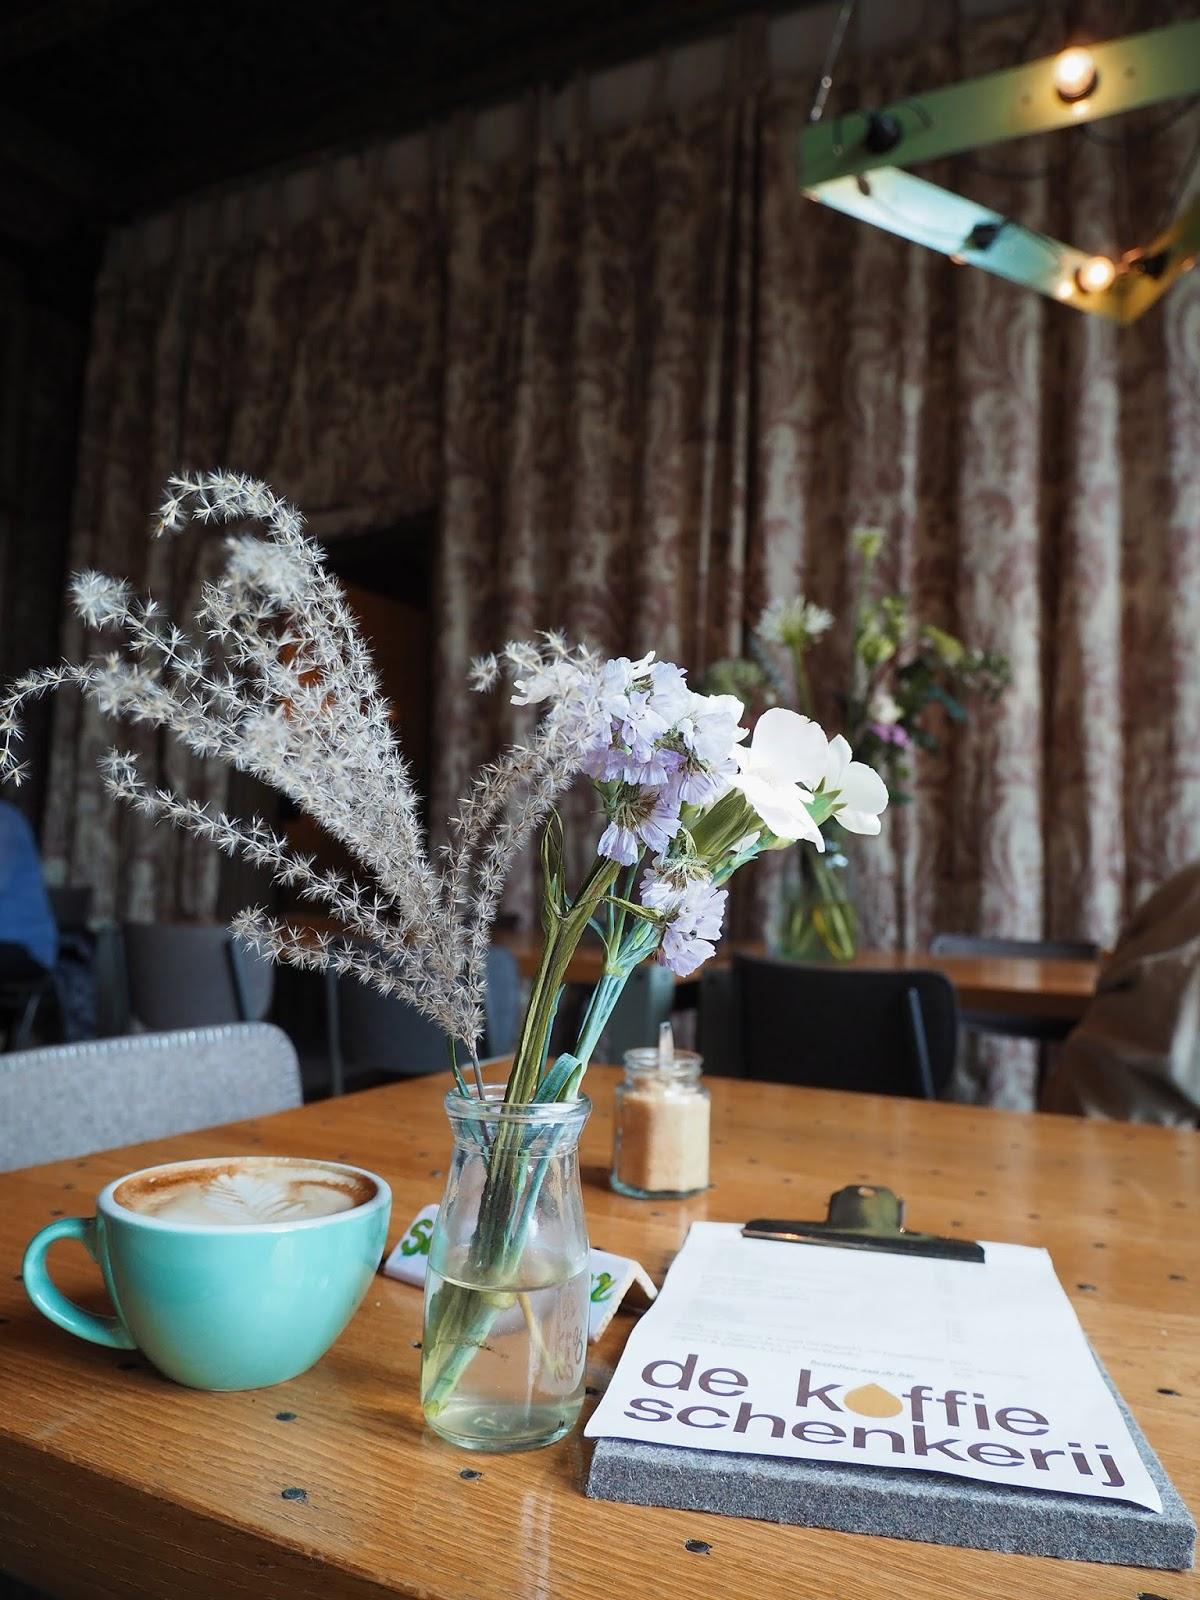 Euriental | luxury travel & style | De Koffieschenkerij Amsterdam